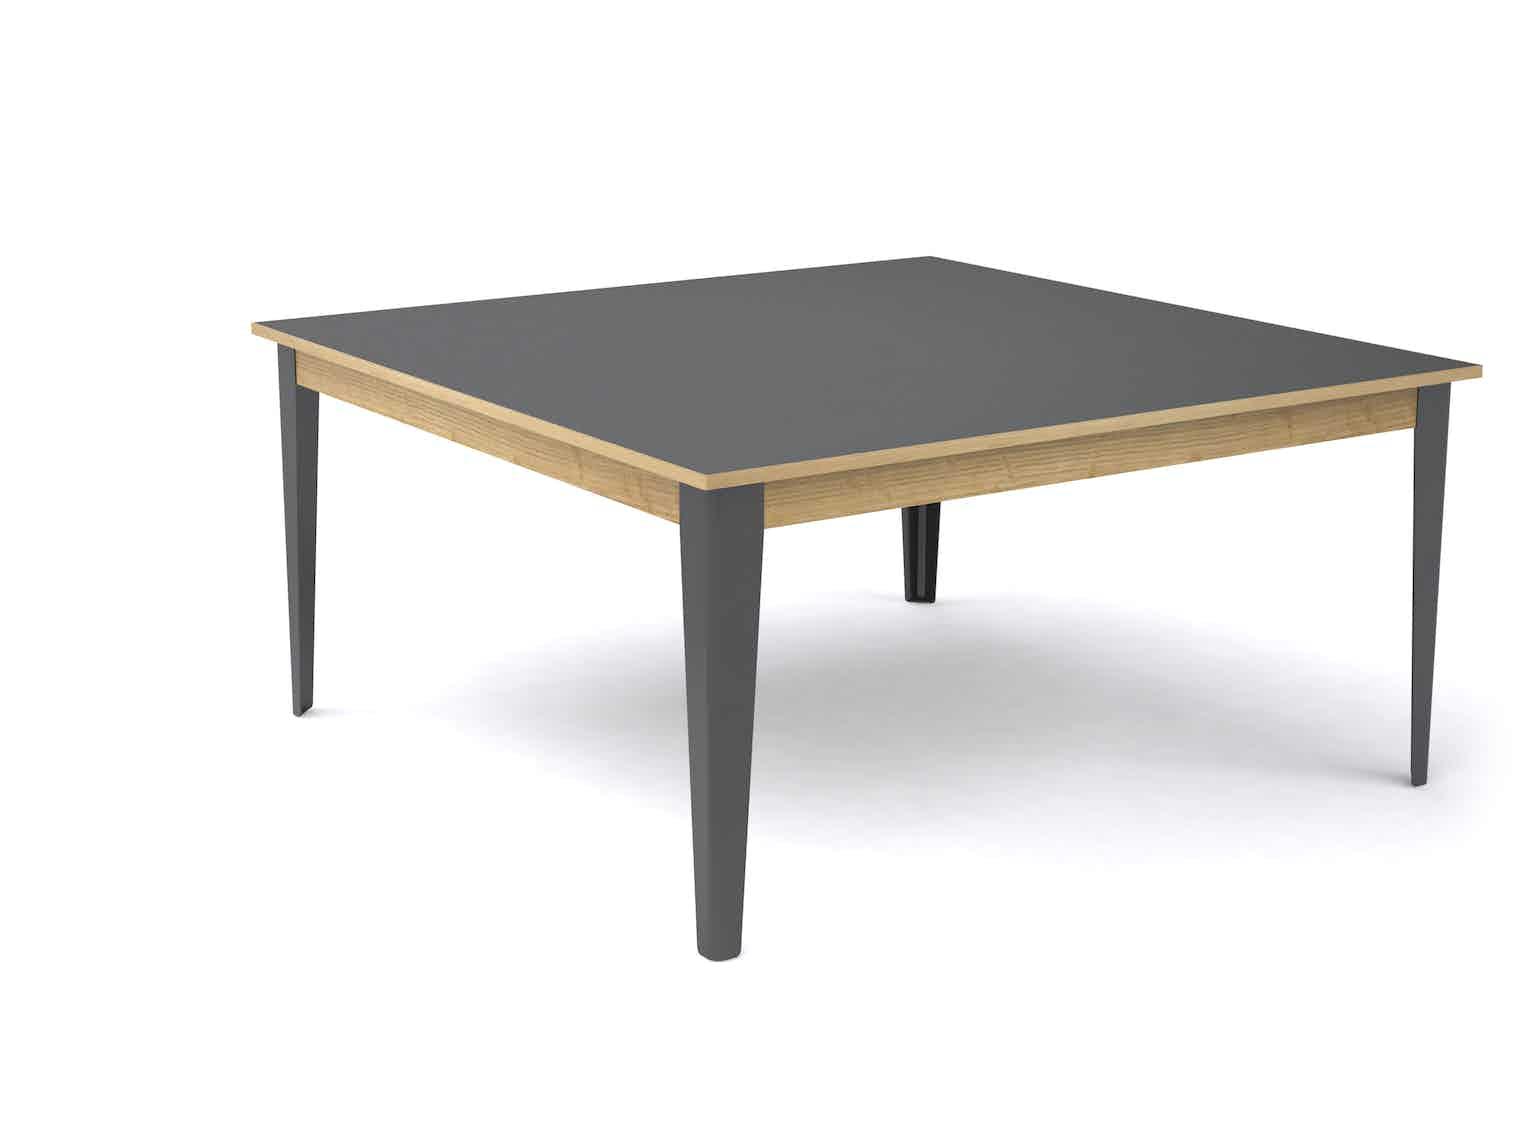 Deadgood-tree-table-close-square-side-haute-living